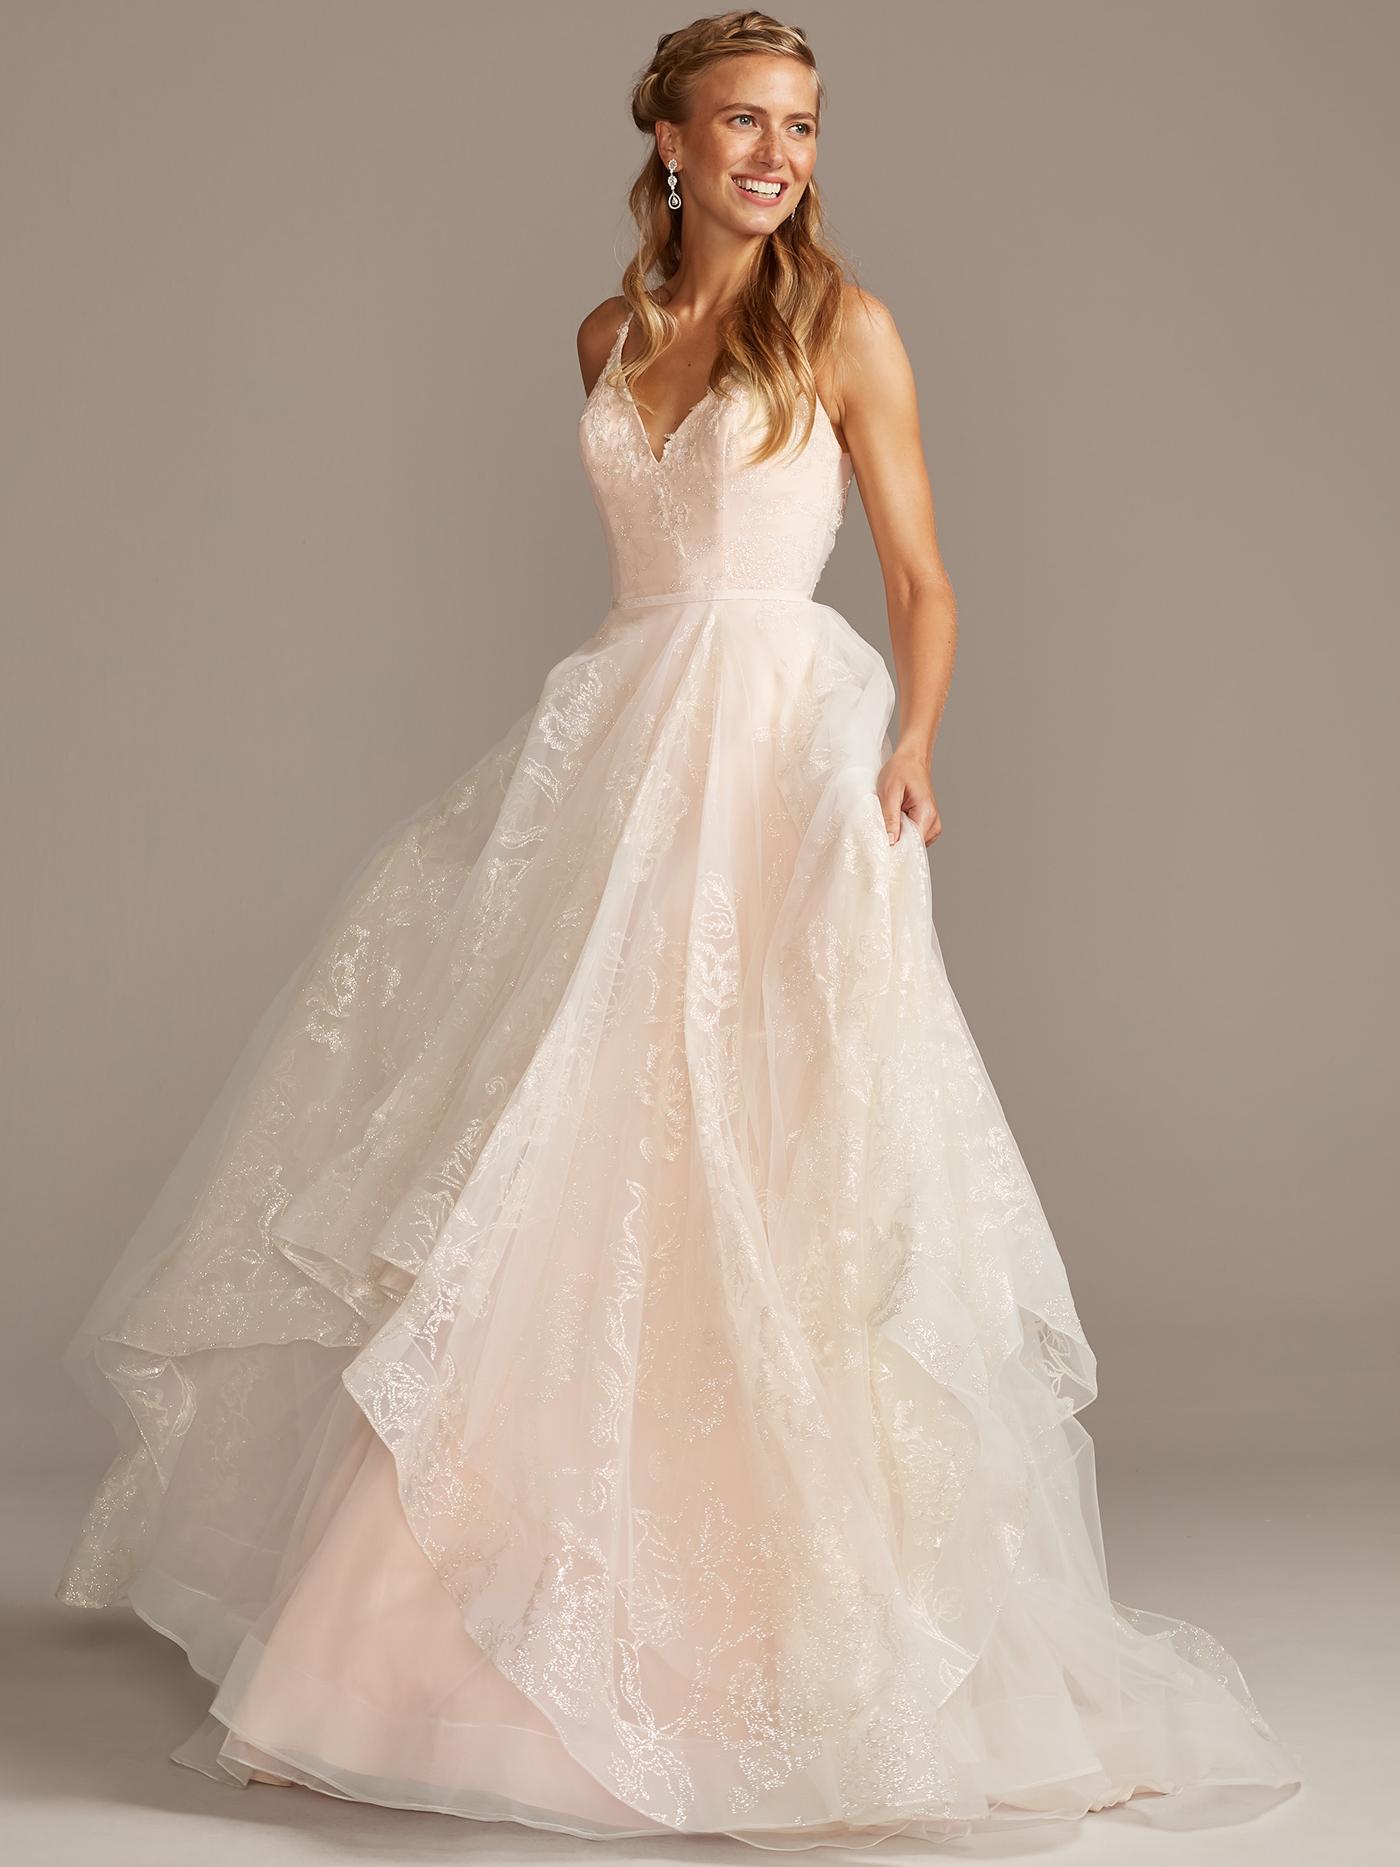 davids bridal ball gown v-neck wedding dress fall 2020